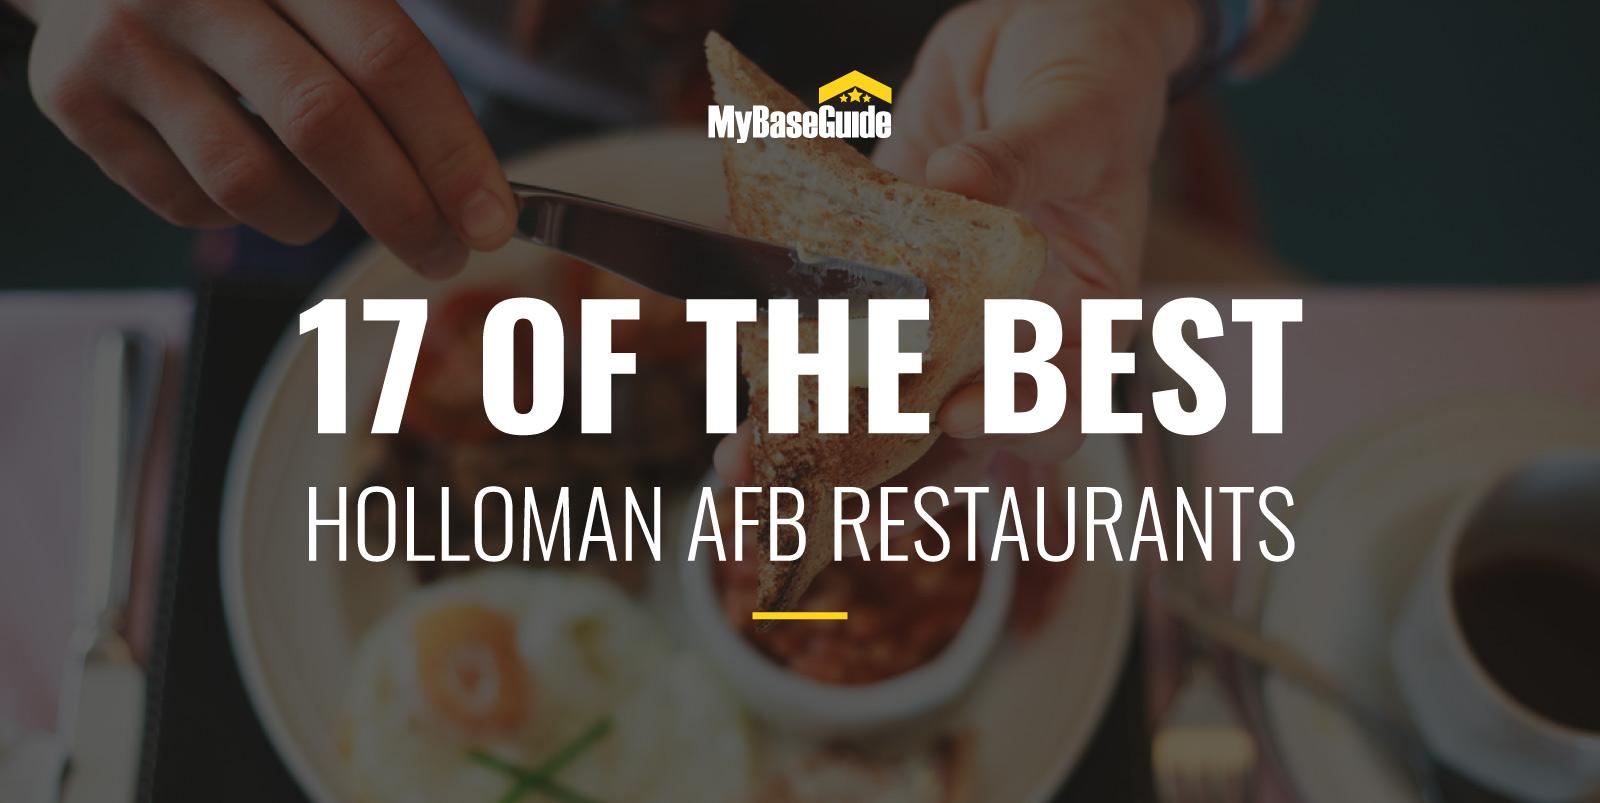 17 of the Best Holloman AFB Restaurants